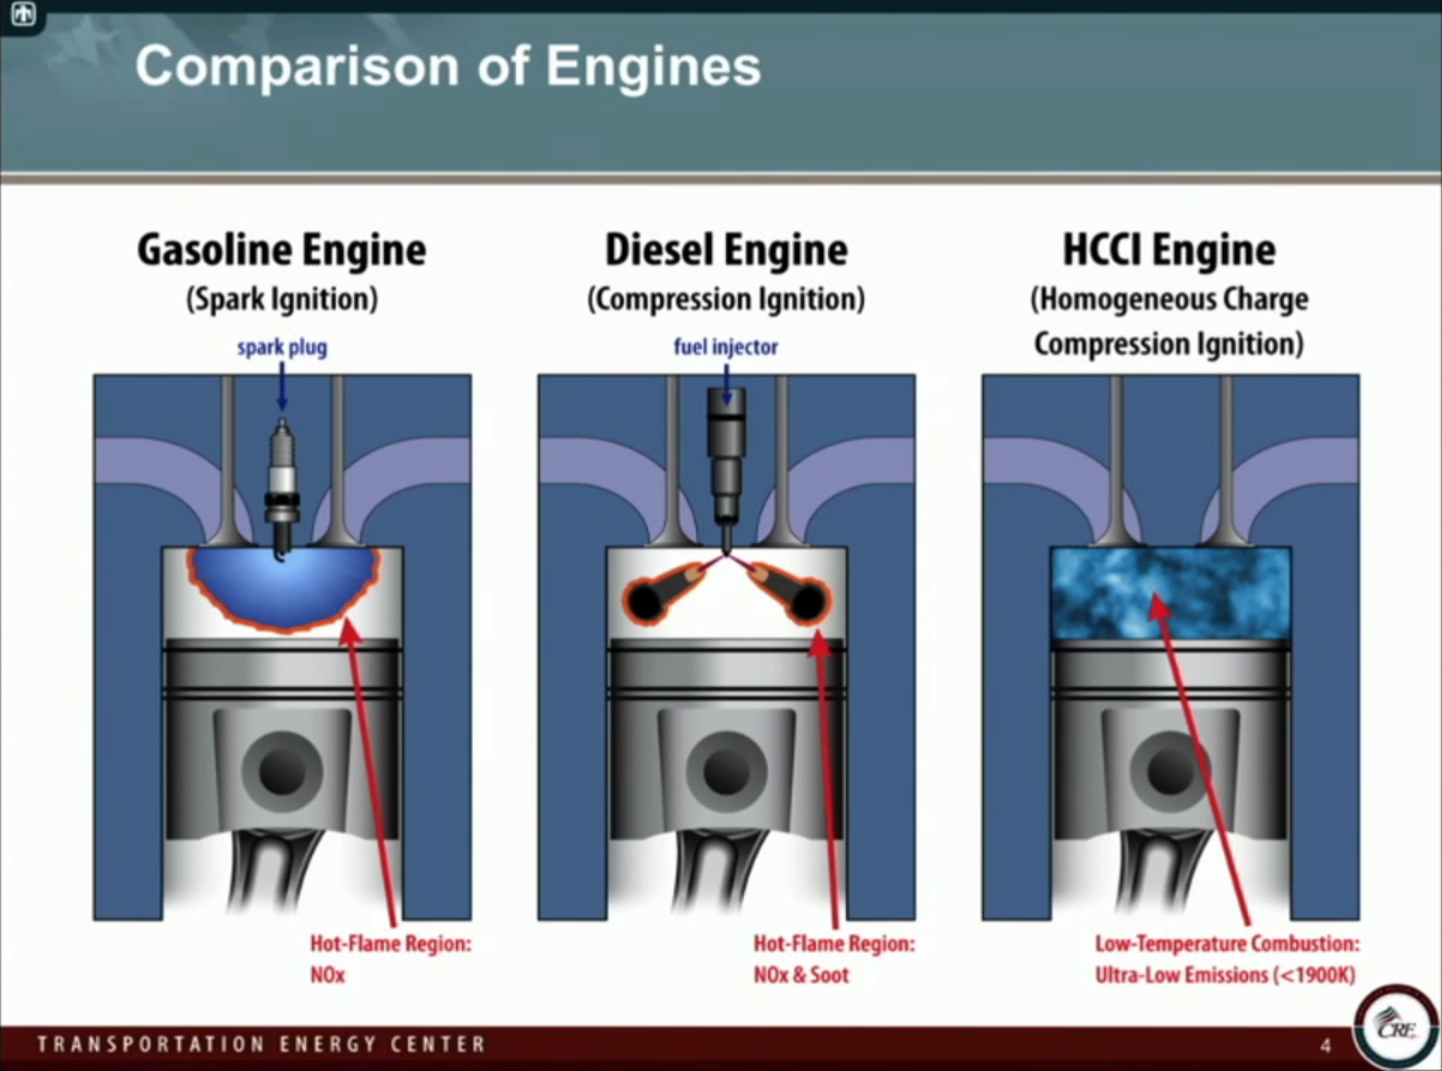 Video: Towards Exascale Simulation of Turbulent Combustion, Jacqueline Chen (Sandia National Laboratories, USA)